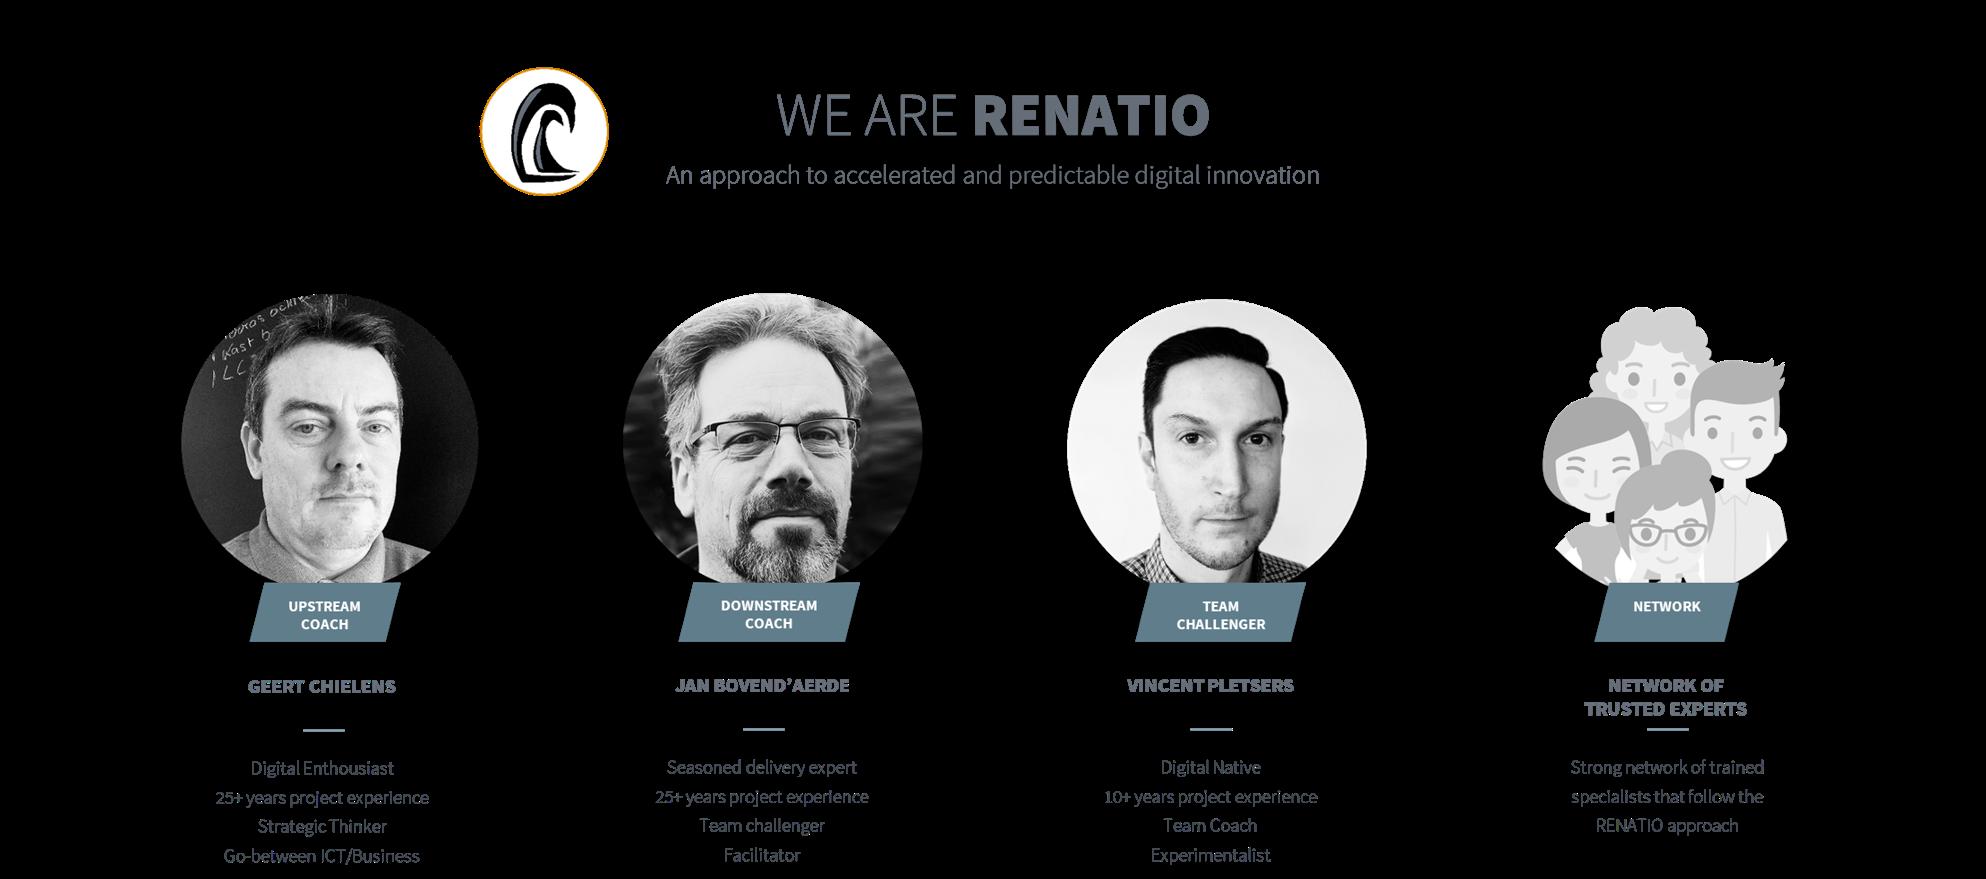 we are renatio